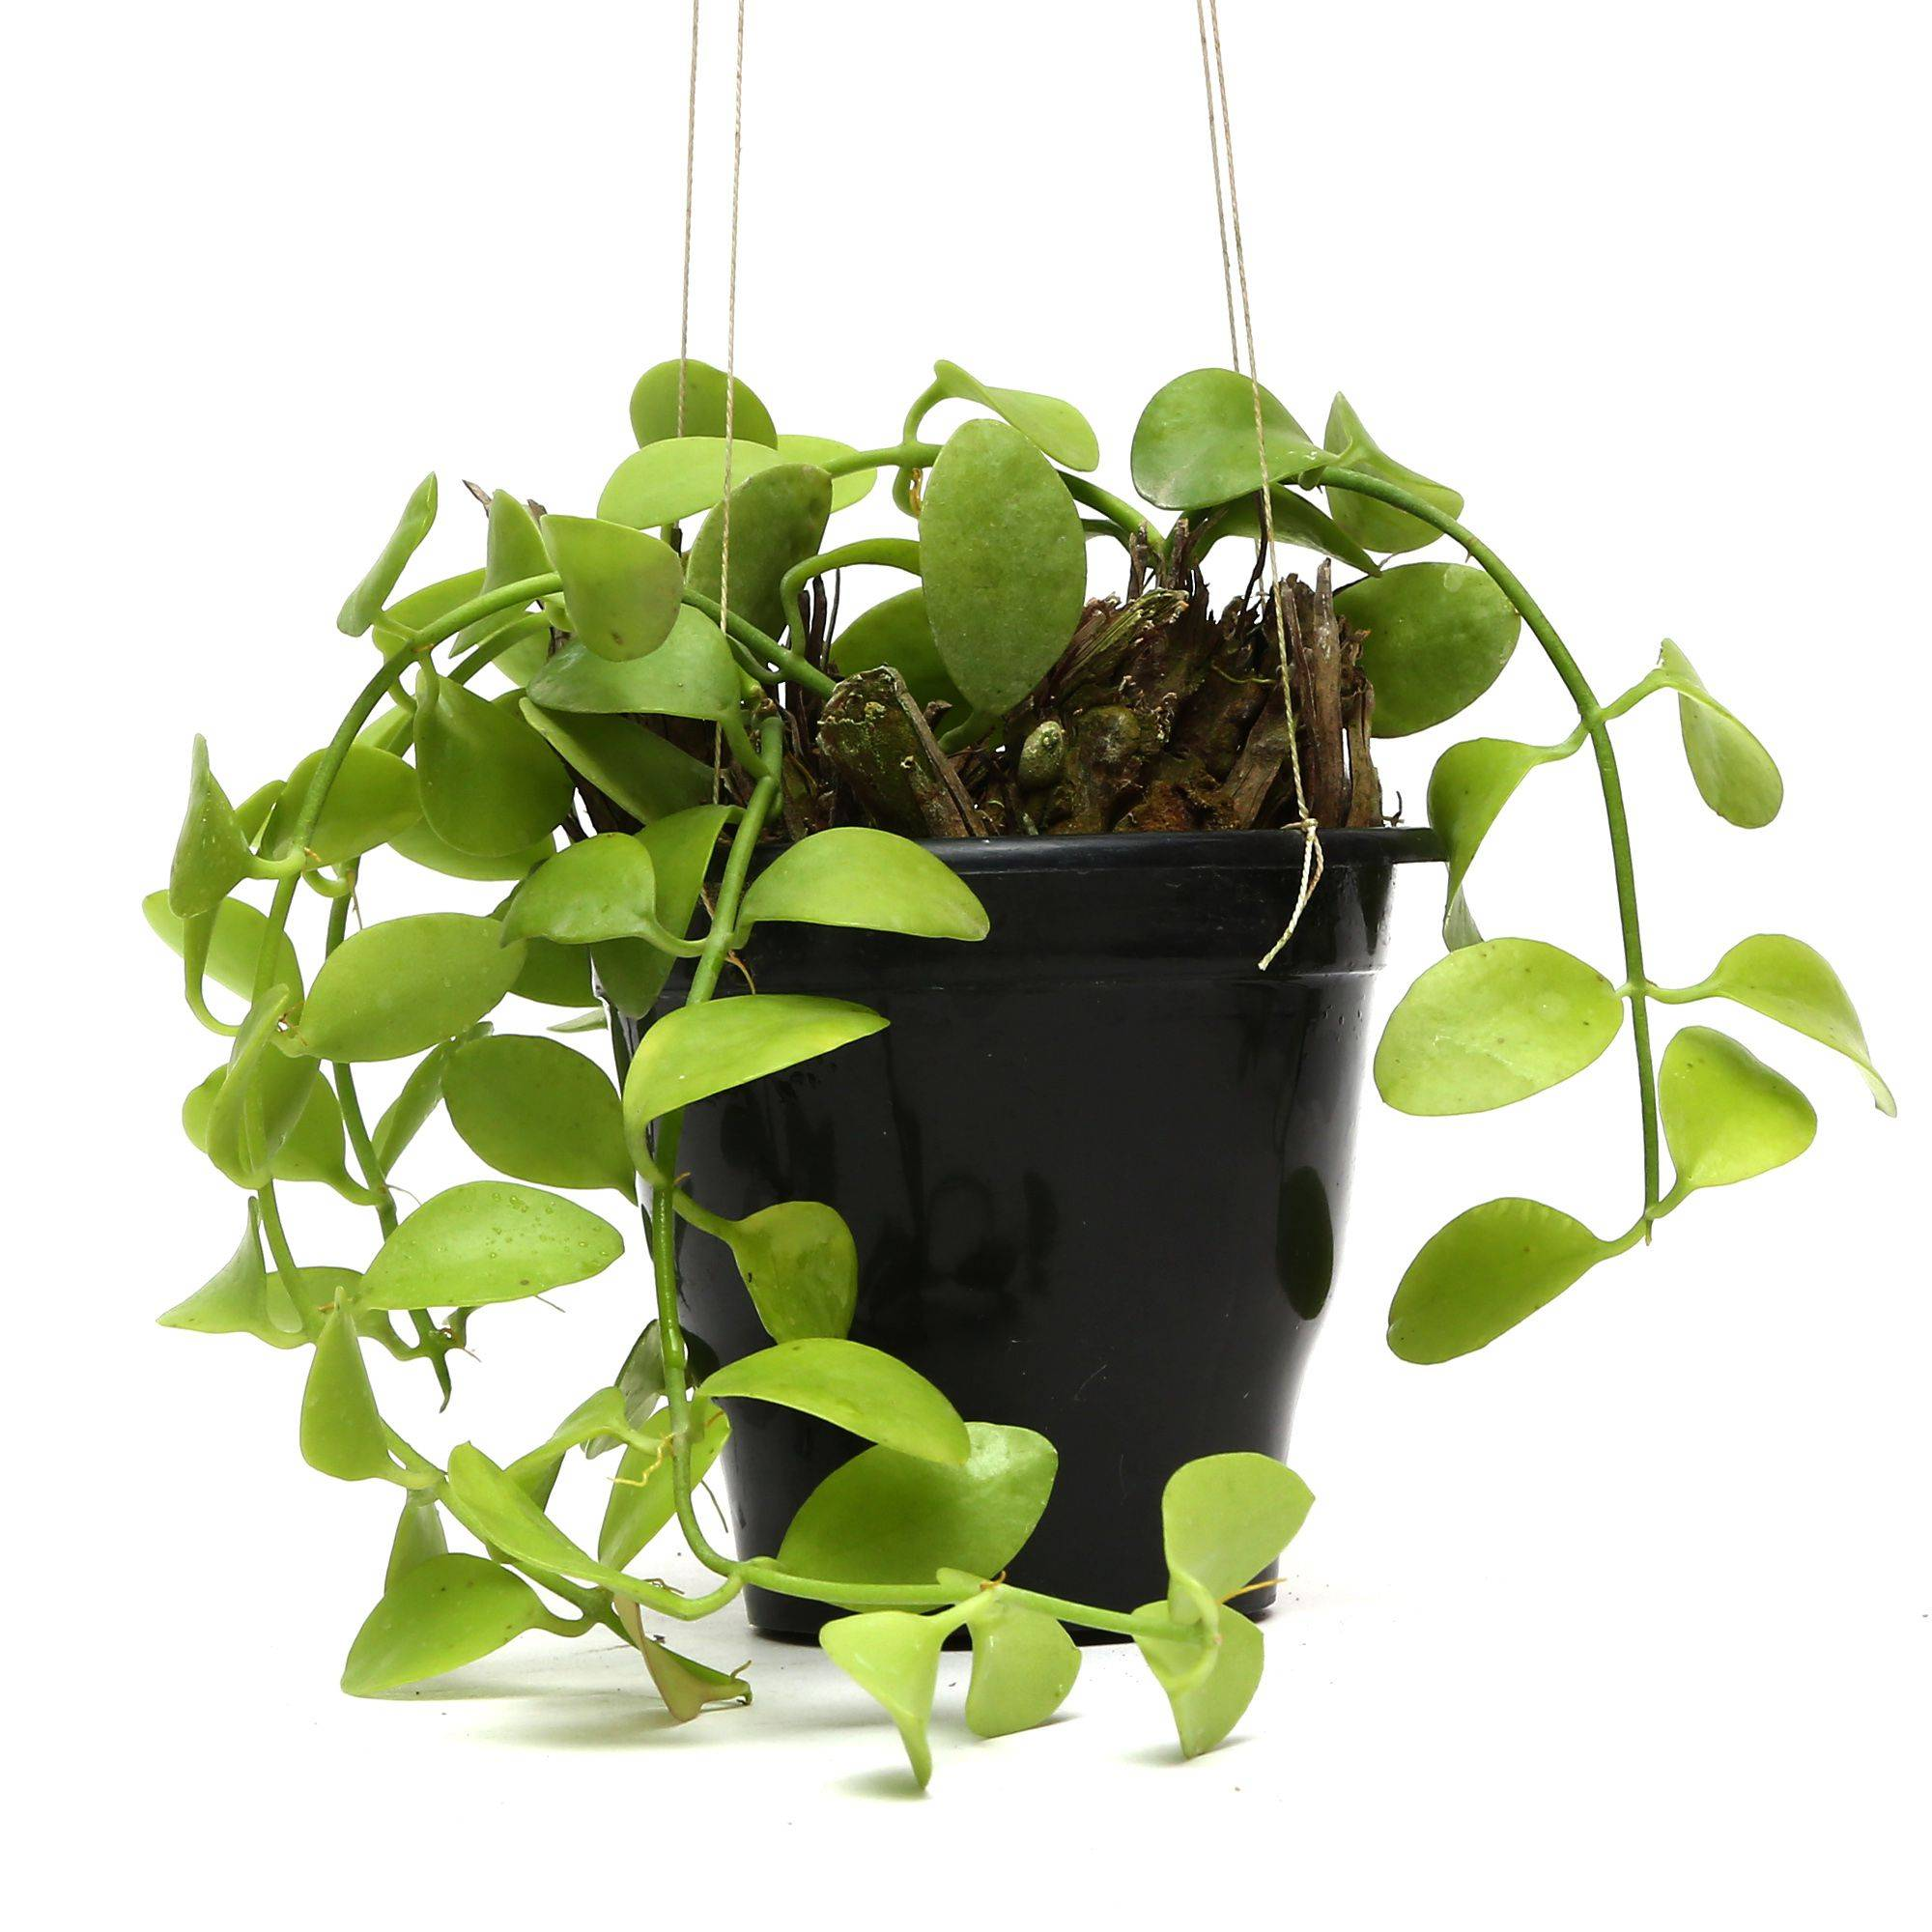 Plants Pots Hanging Hoya Plants SDL 3 0d67d JPG